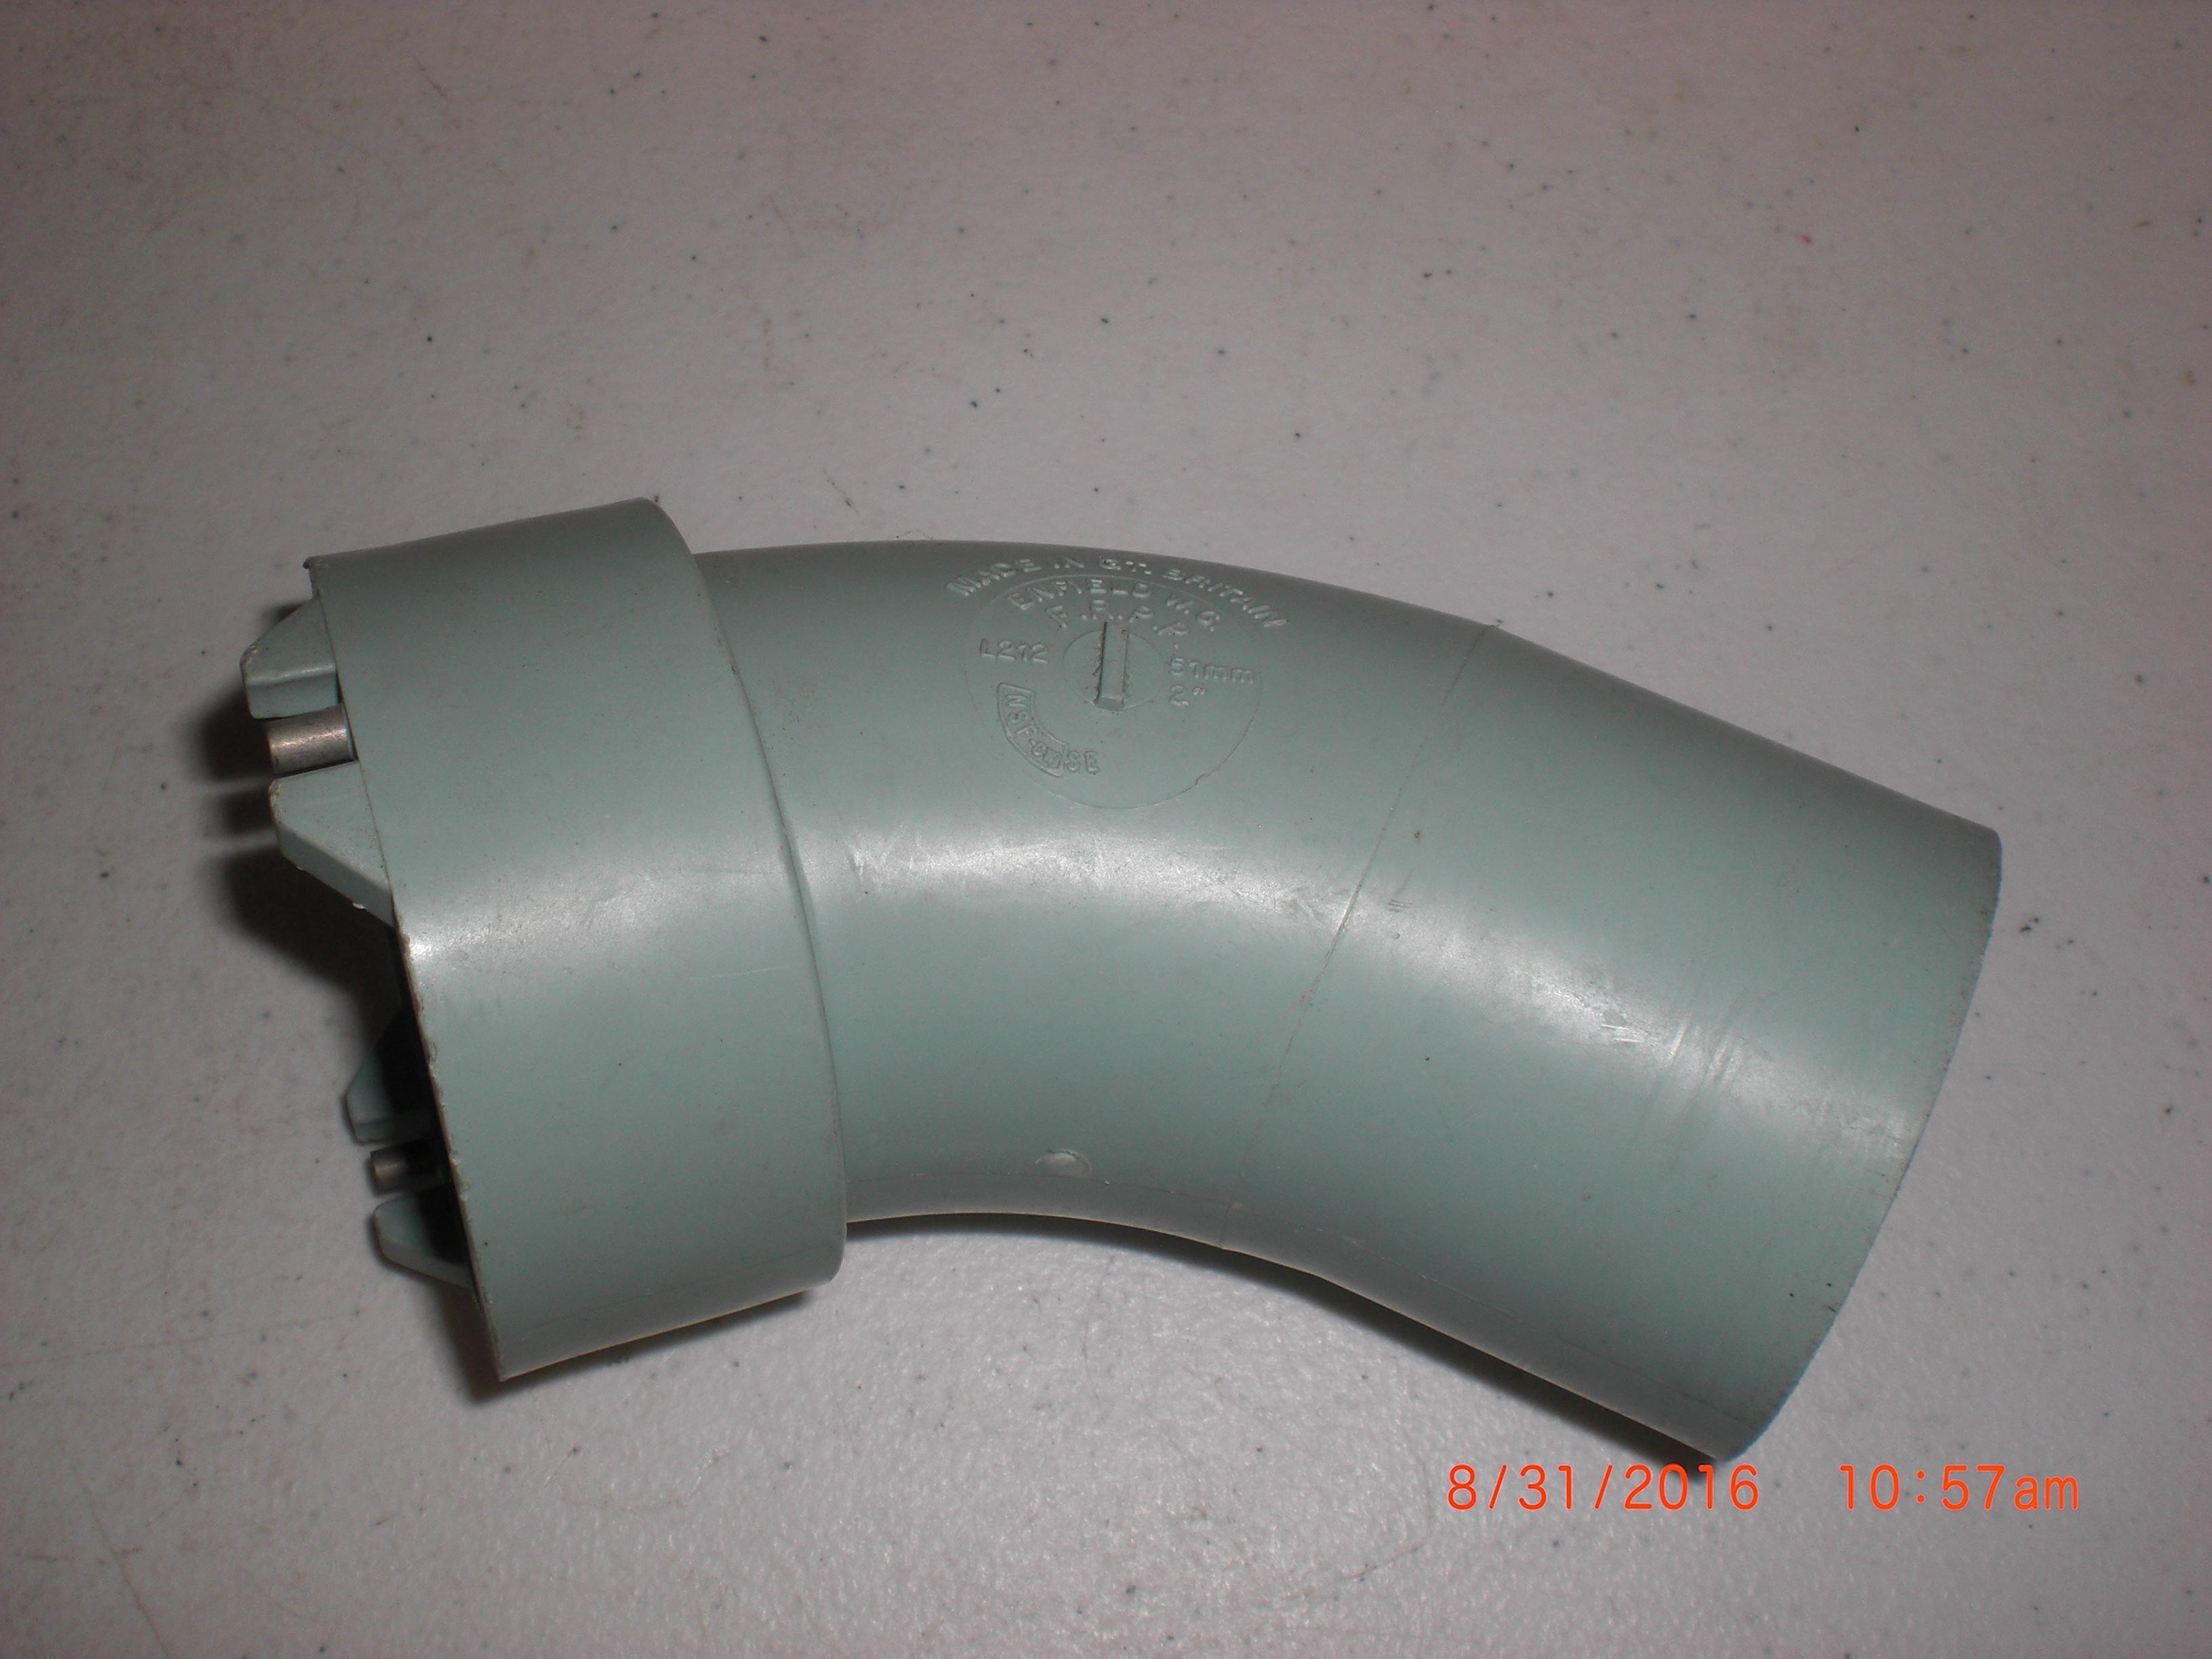 Fitting Enfield L212 Enfusion 2in 1/8 BEND EJ x Sp 45 deg FRPP acid waste